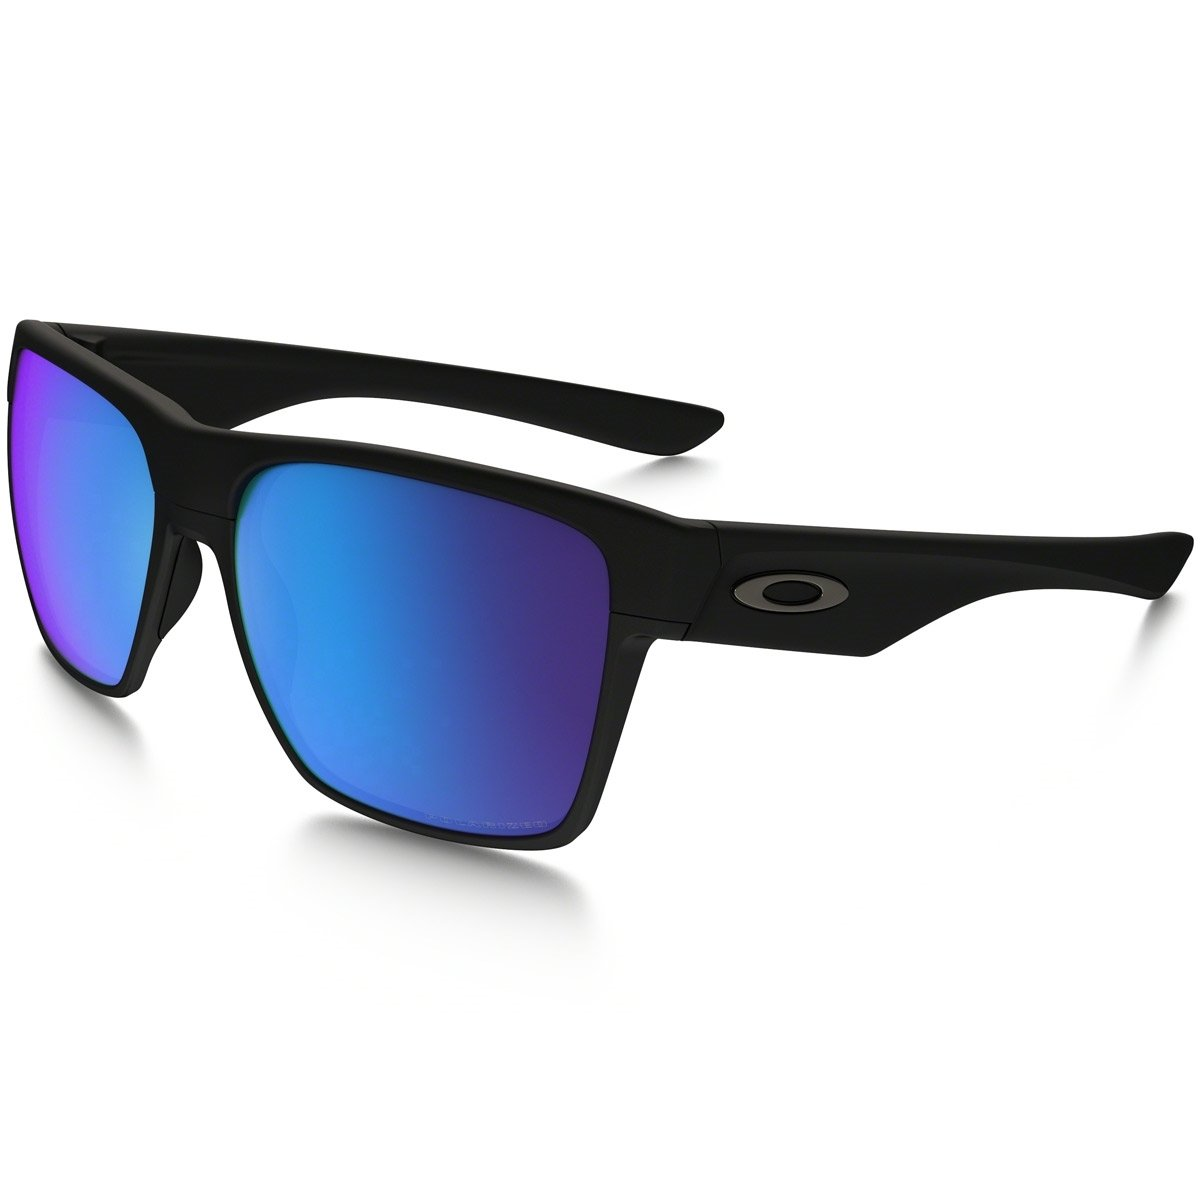 44e07ccbd32c9 Óculos Oakley Twoface Xl - Matte Black   Sapphire Iridium Polarized - Compre  Agora